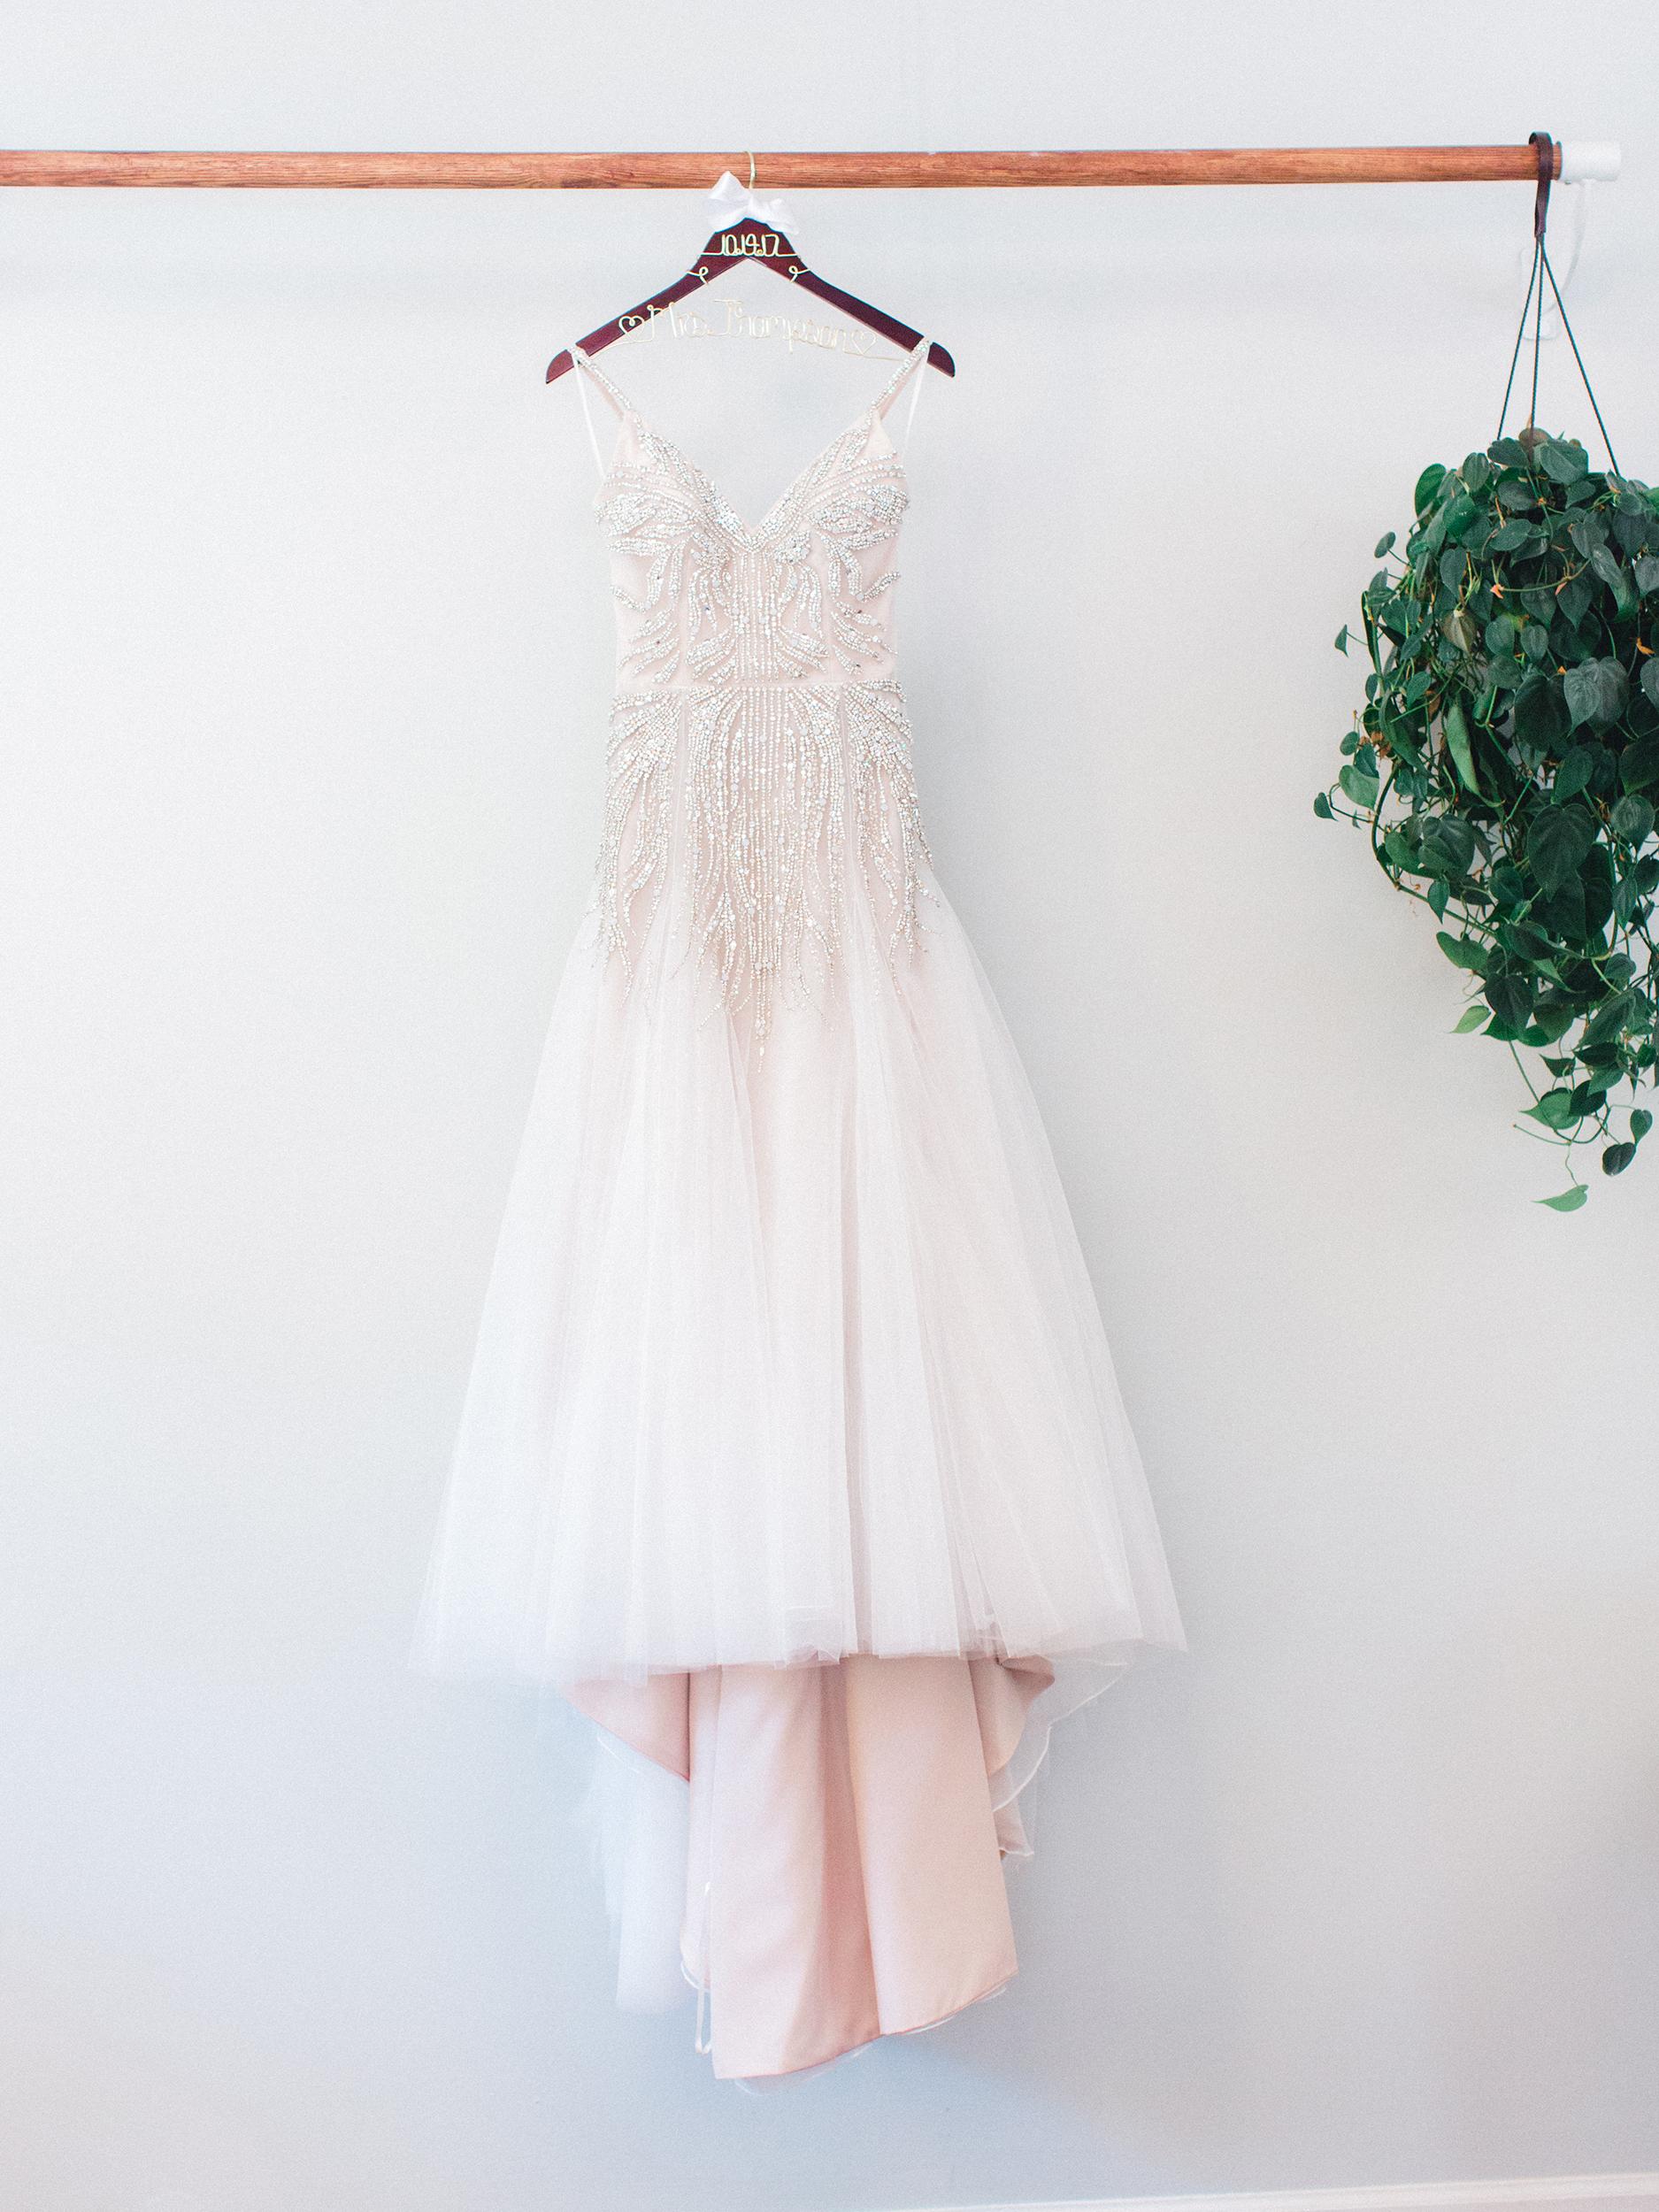 Lisa Silva Photography- Jacksonville, Florida Fine Art Film Wedding Photography Epping Forrest Yacht Club 5.jpg